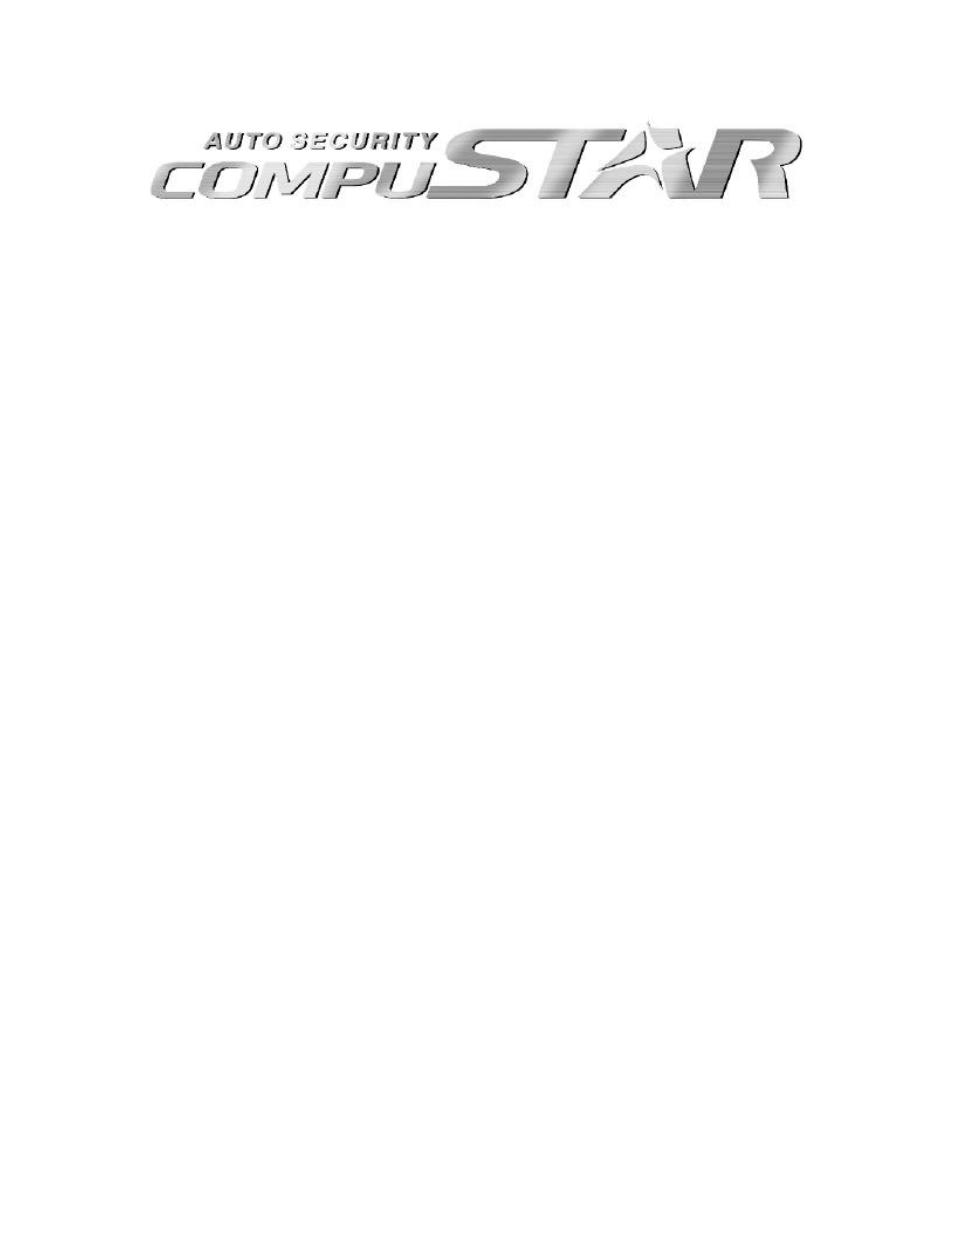 firstech llc compustar cm3000 user manual 8 pages rh manualsdir com